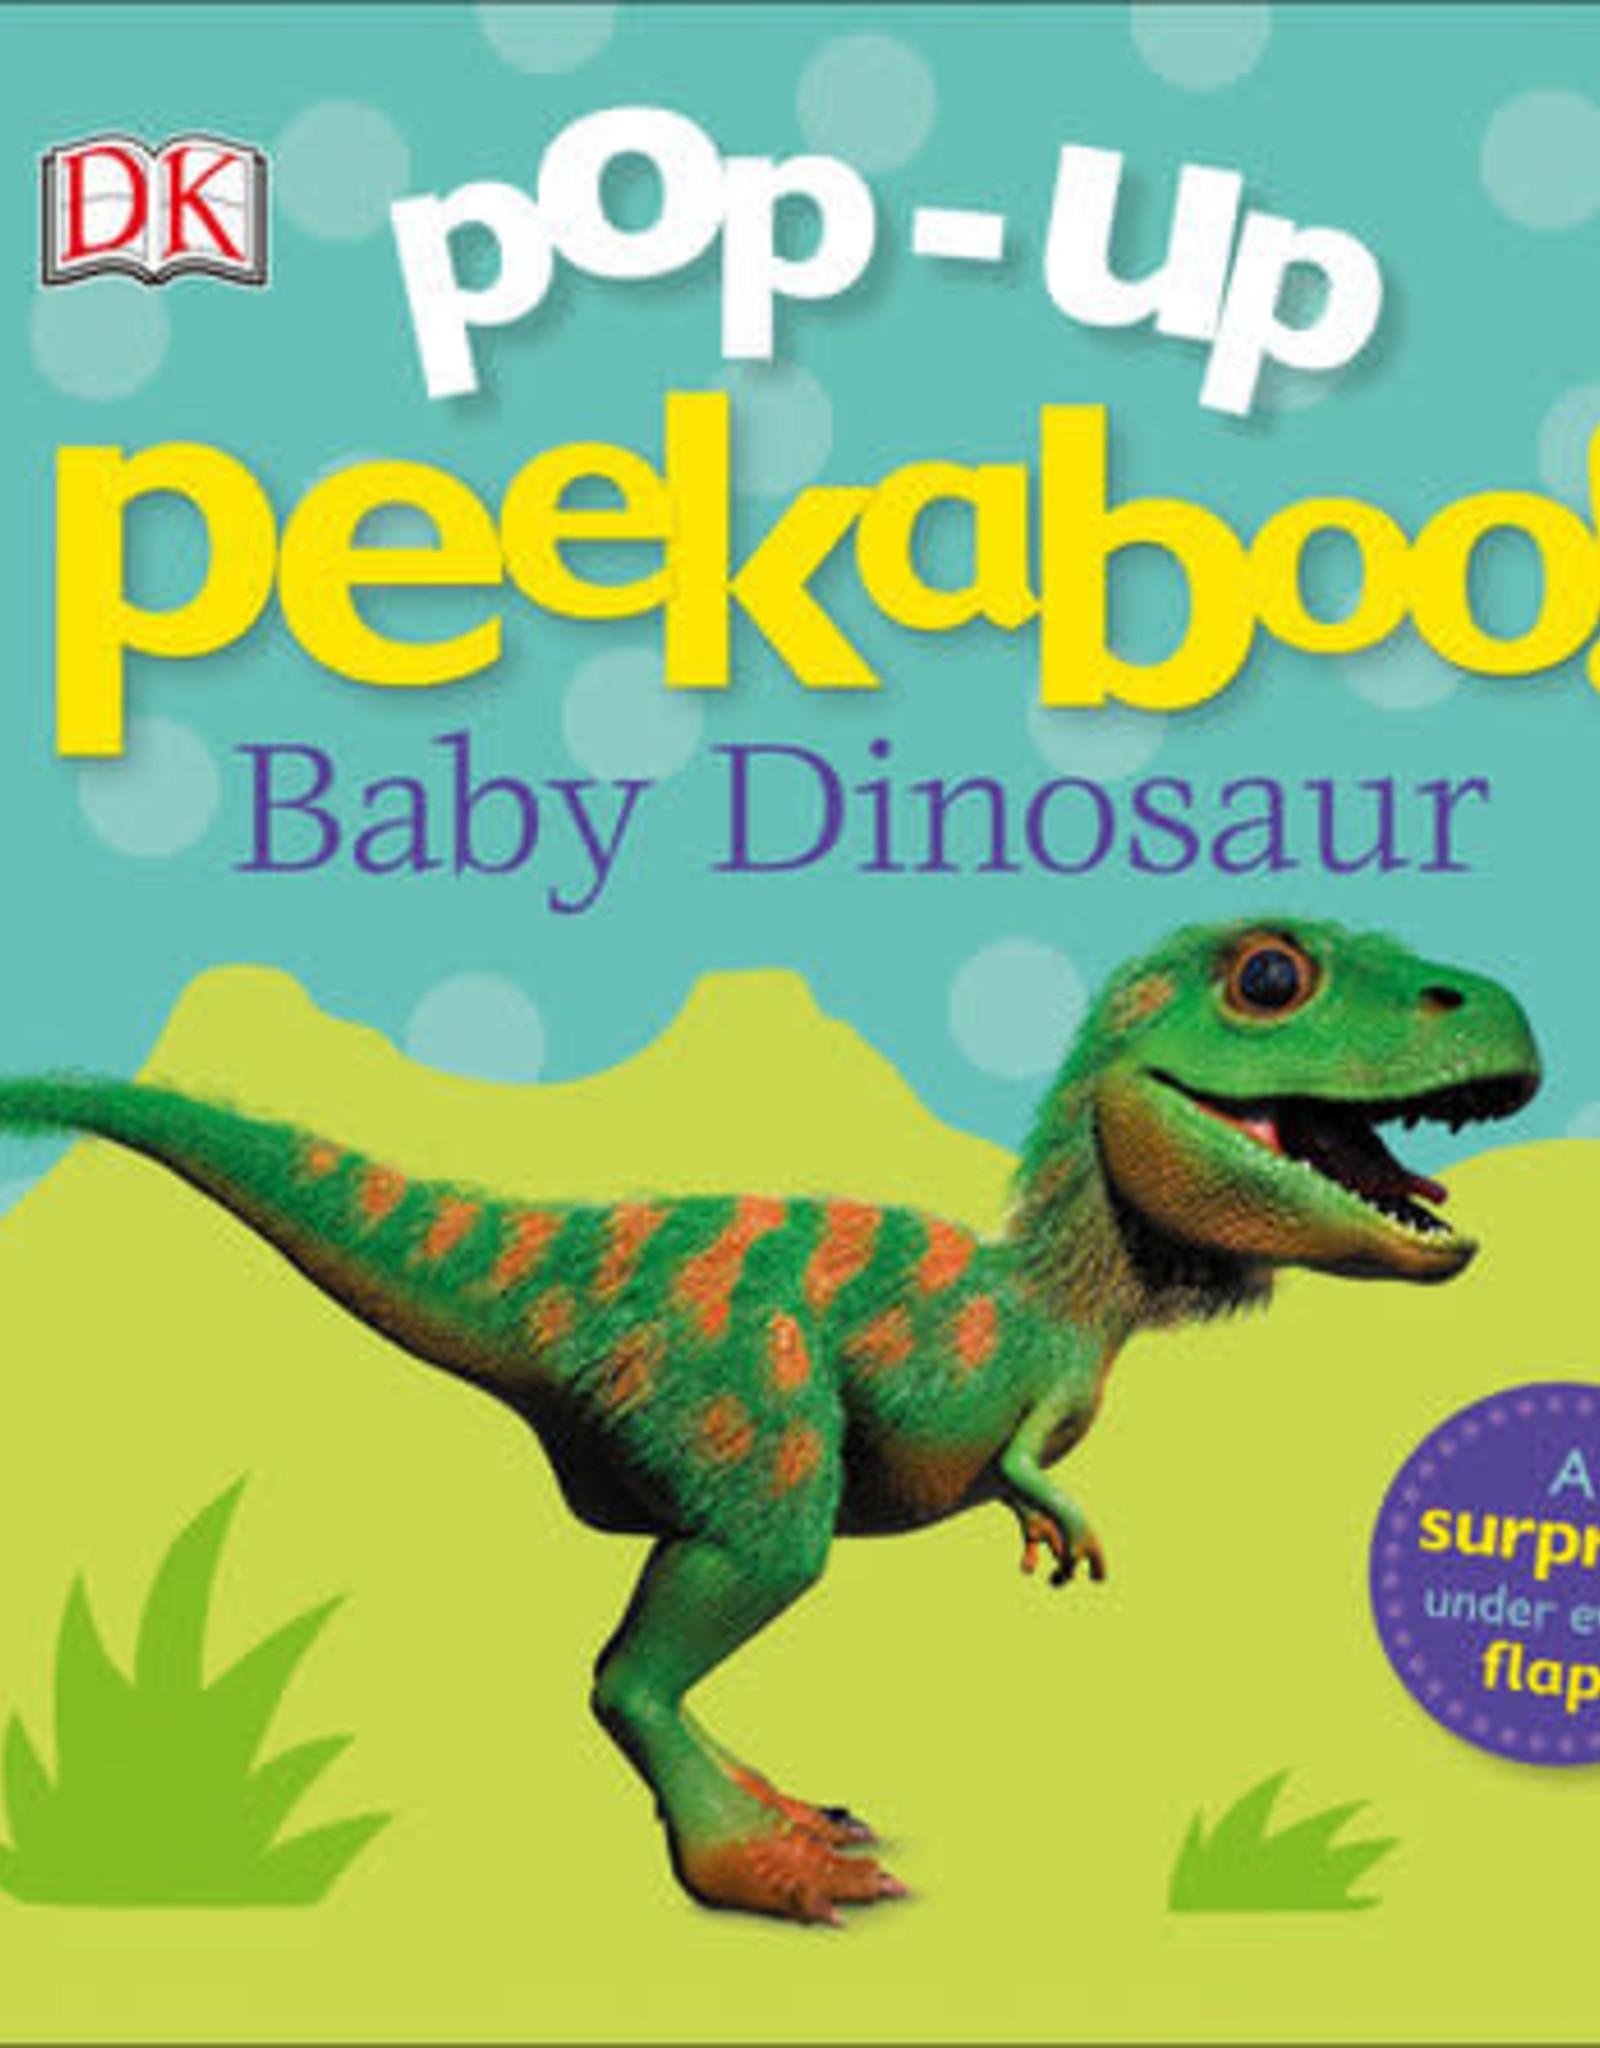 DK Pop Up Baby Dinosaur